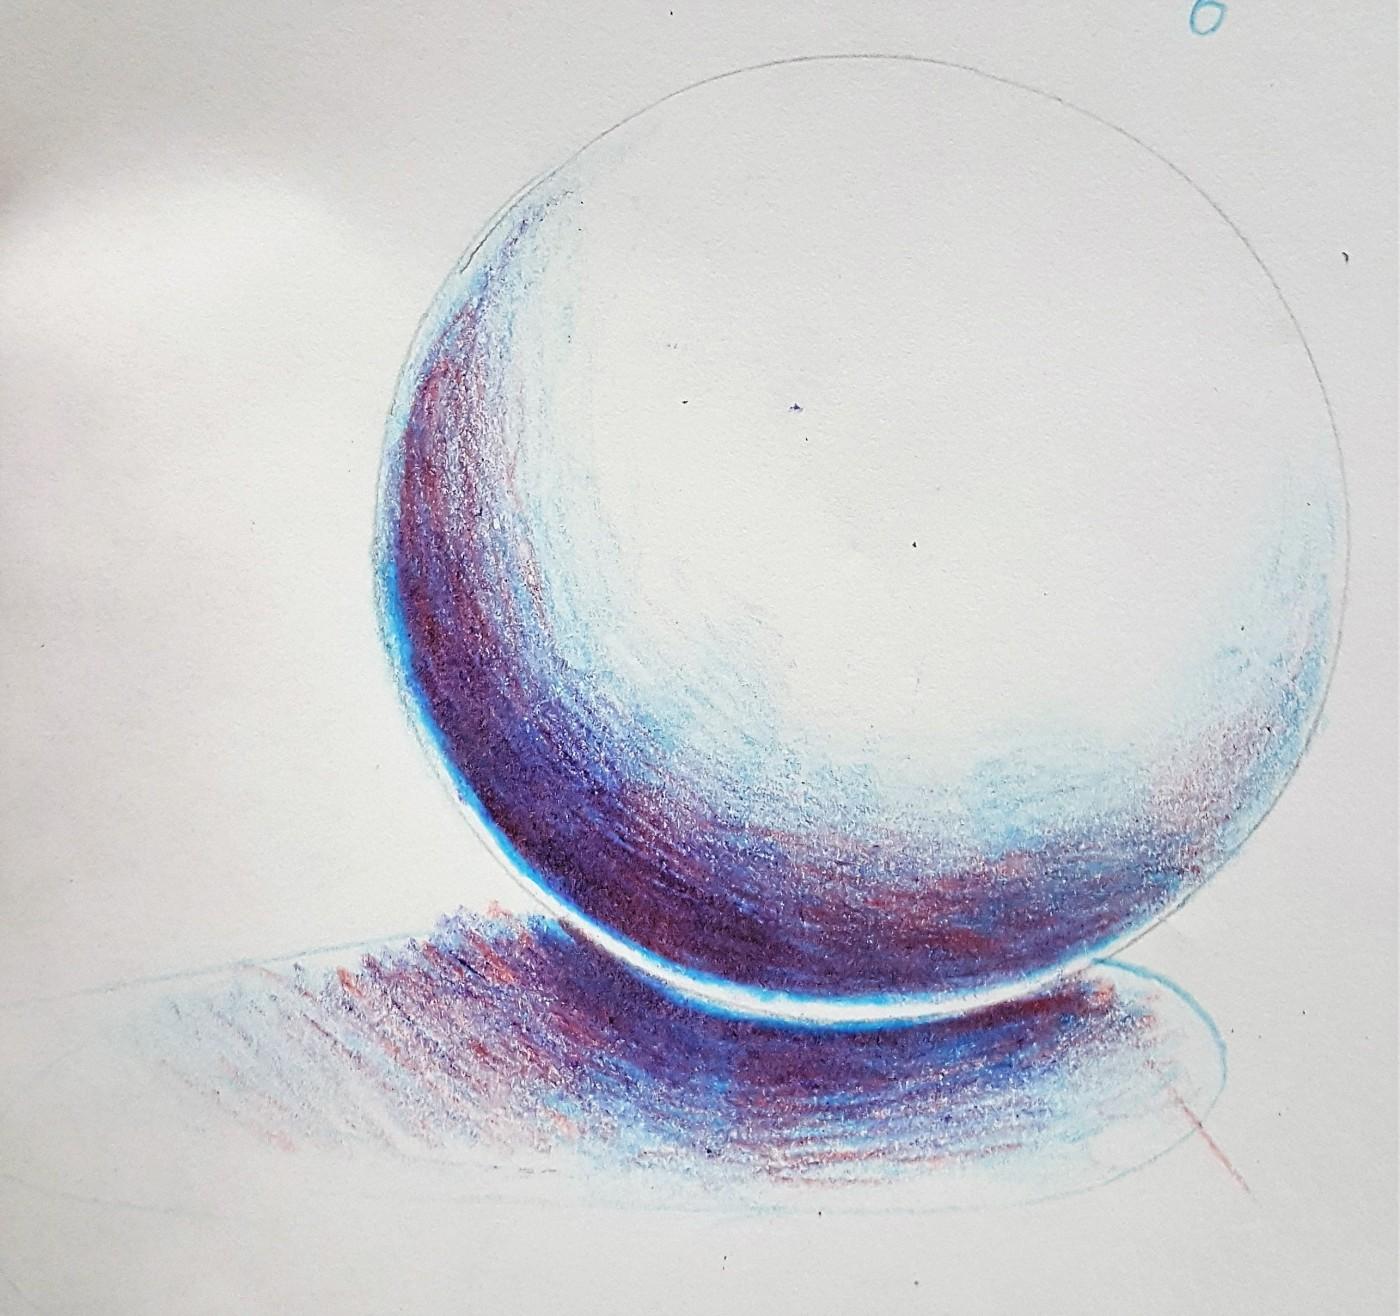 Color Pencil Layering Technique On A Sphere Art Class Bailiwick